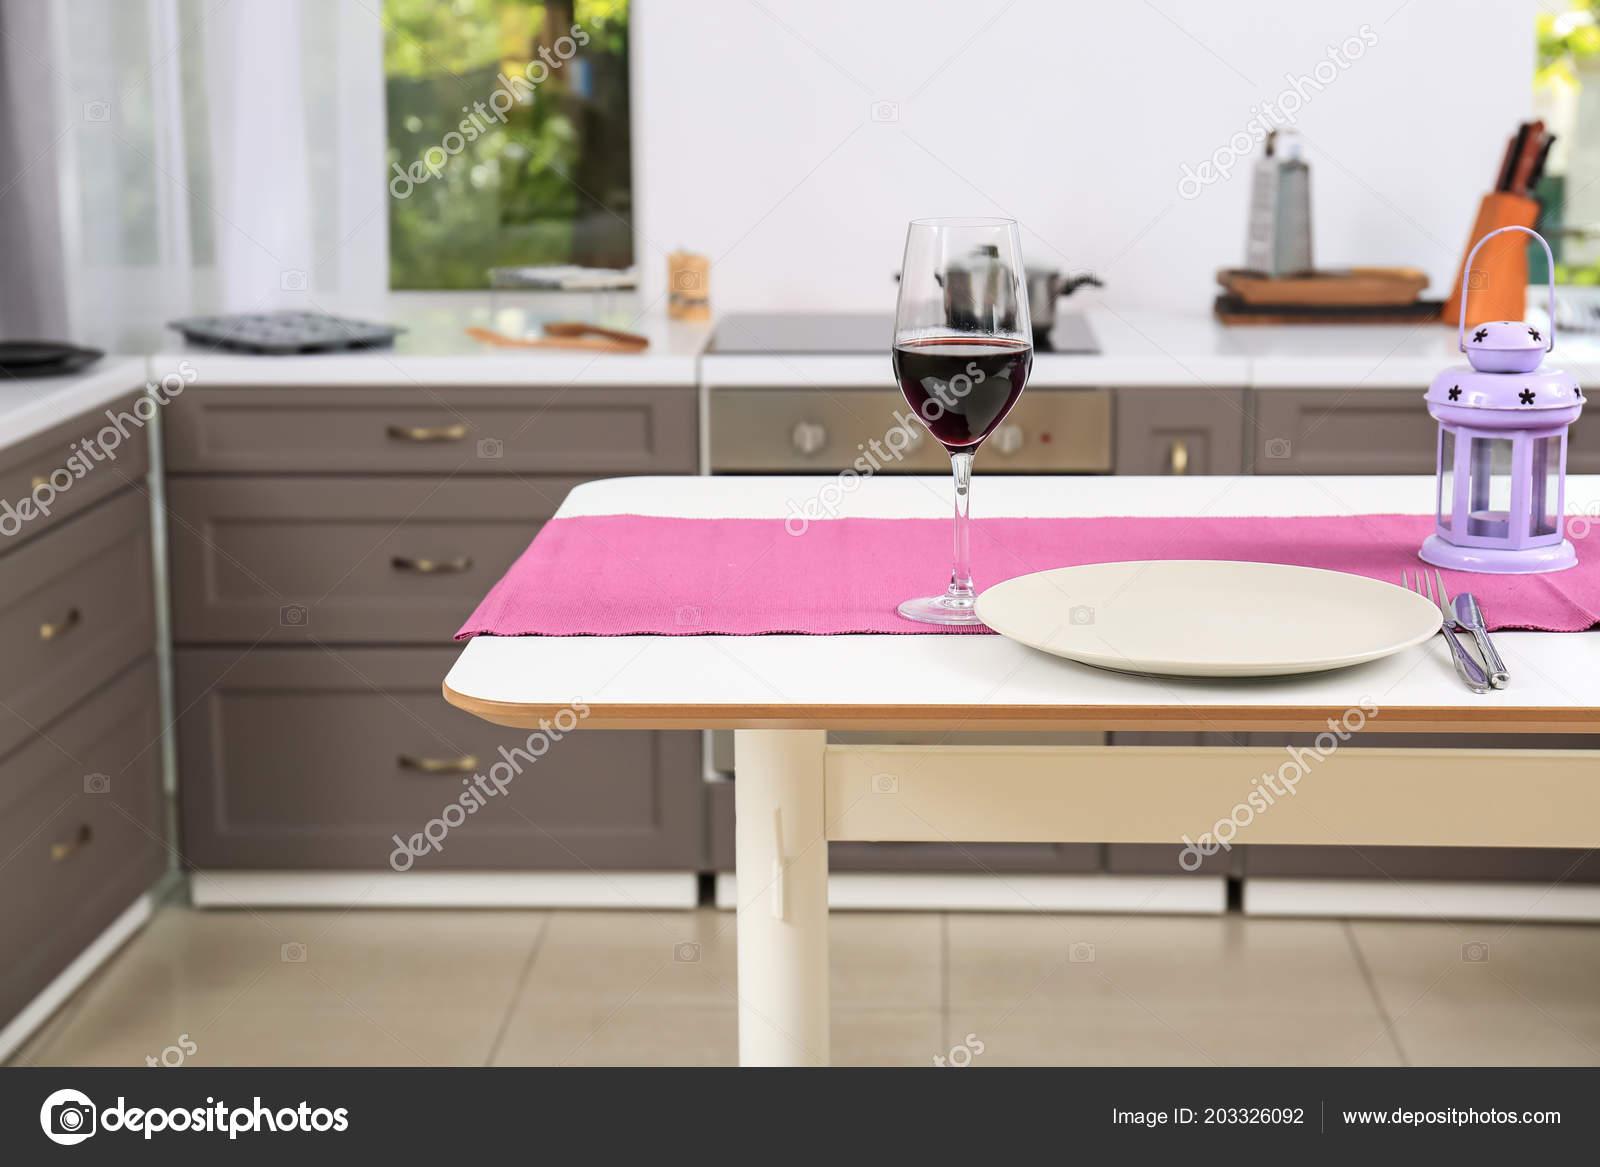 elegante table cuisine moderne photographie belchonock c 203326092